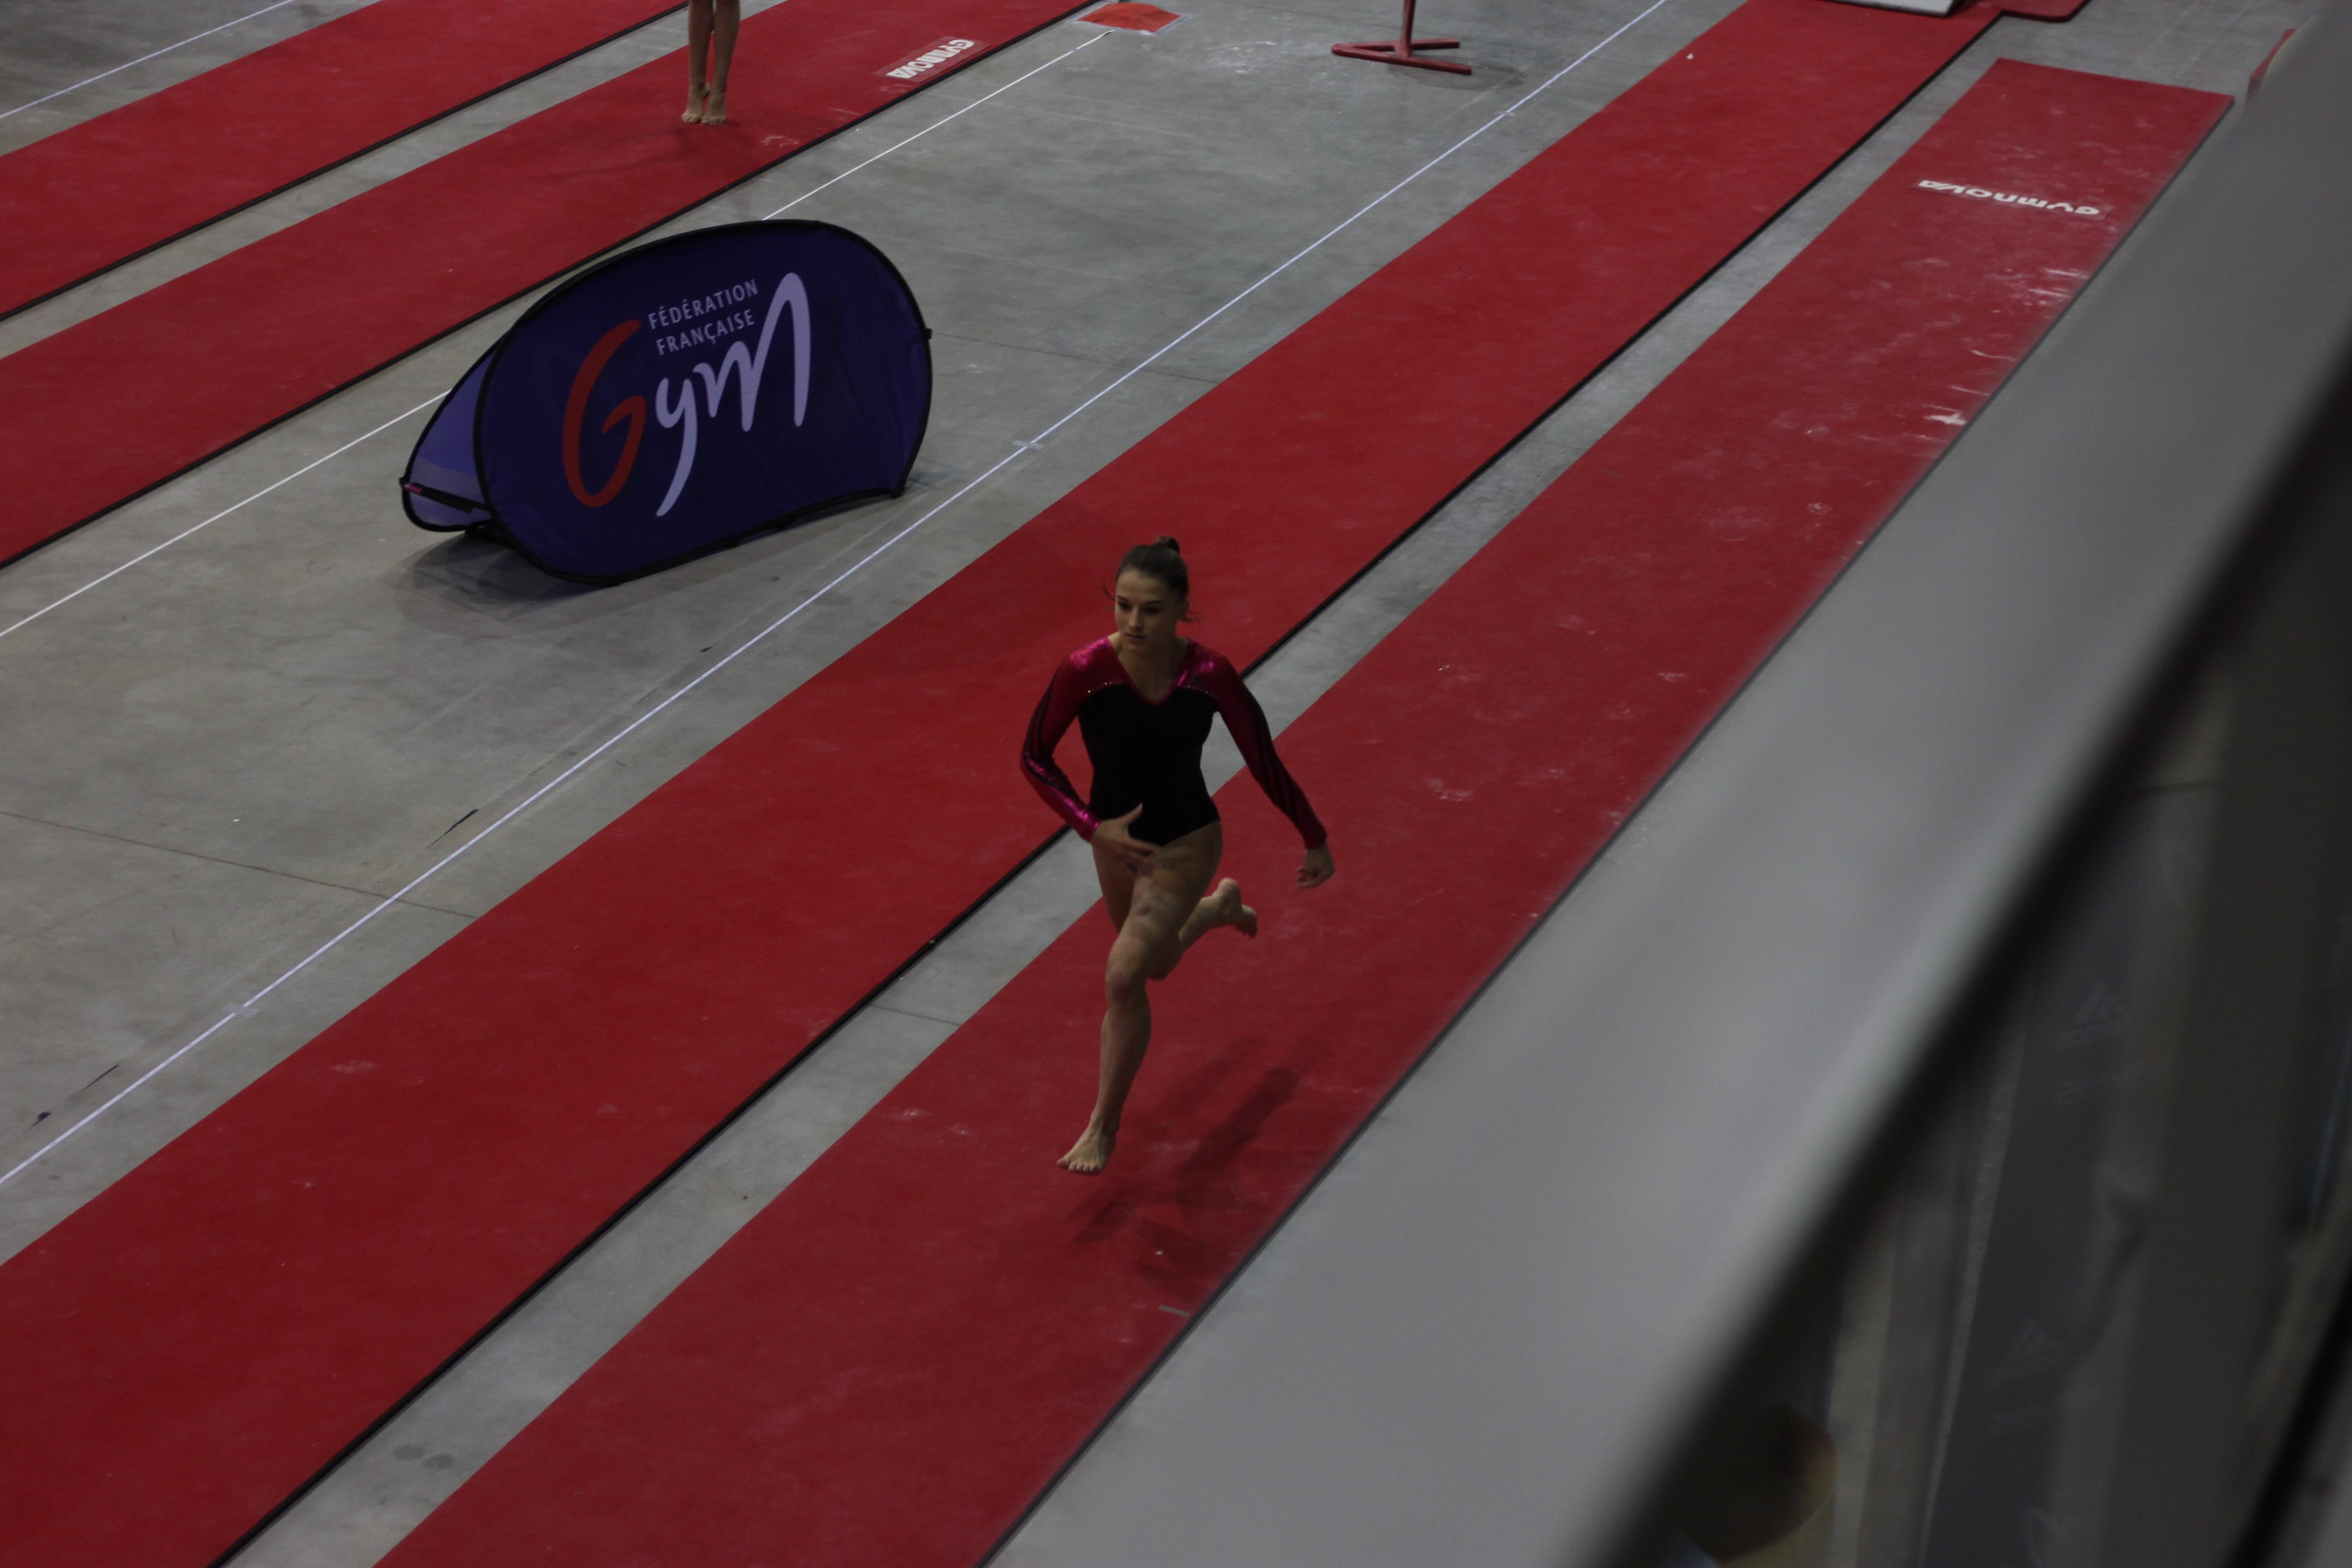 Elisa saut (3)